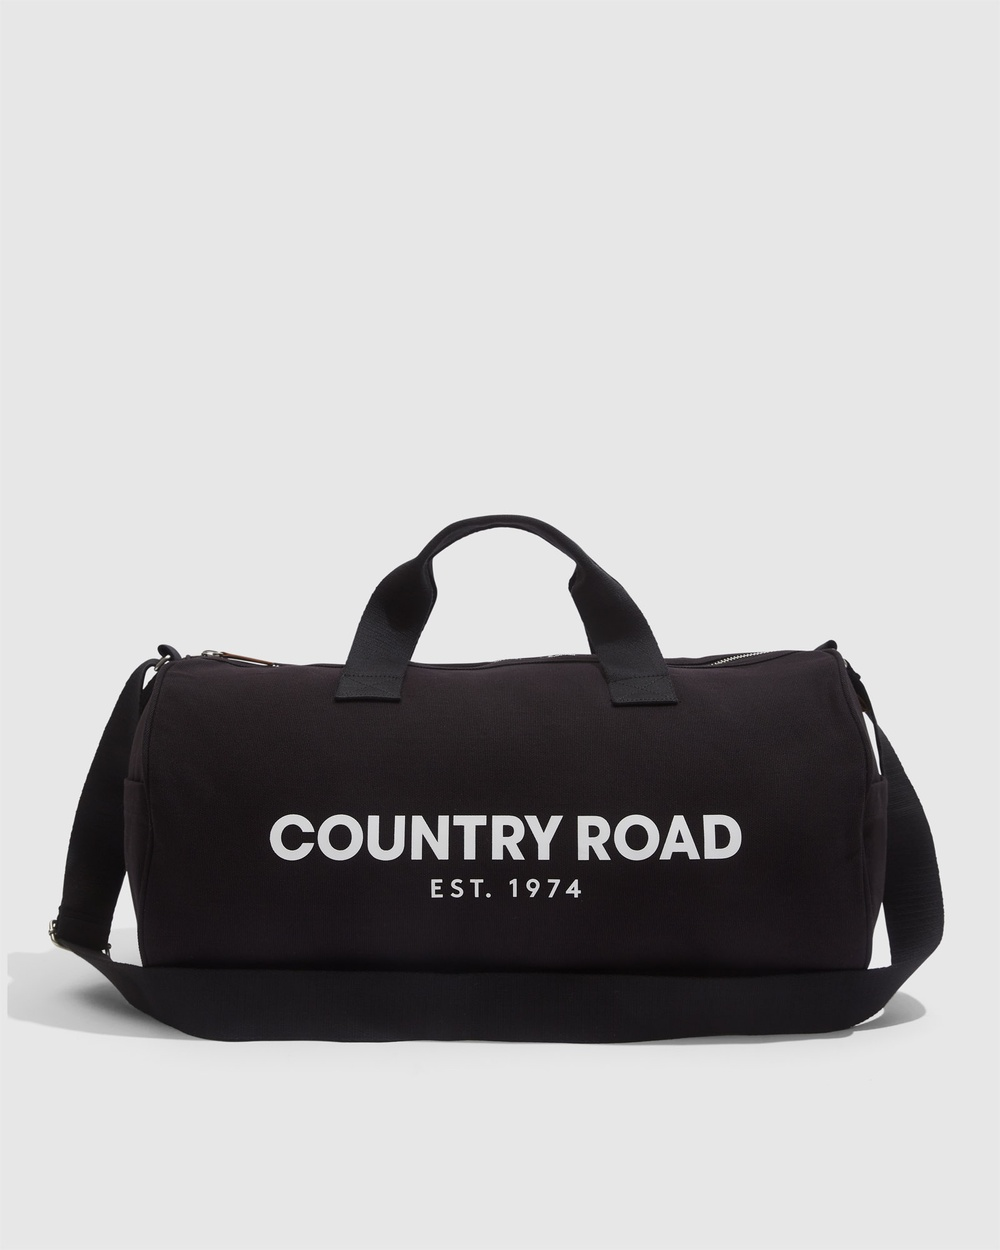 Country Road Organically Grown Cotton Modern Logo Duffle Bags grey